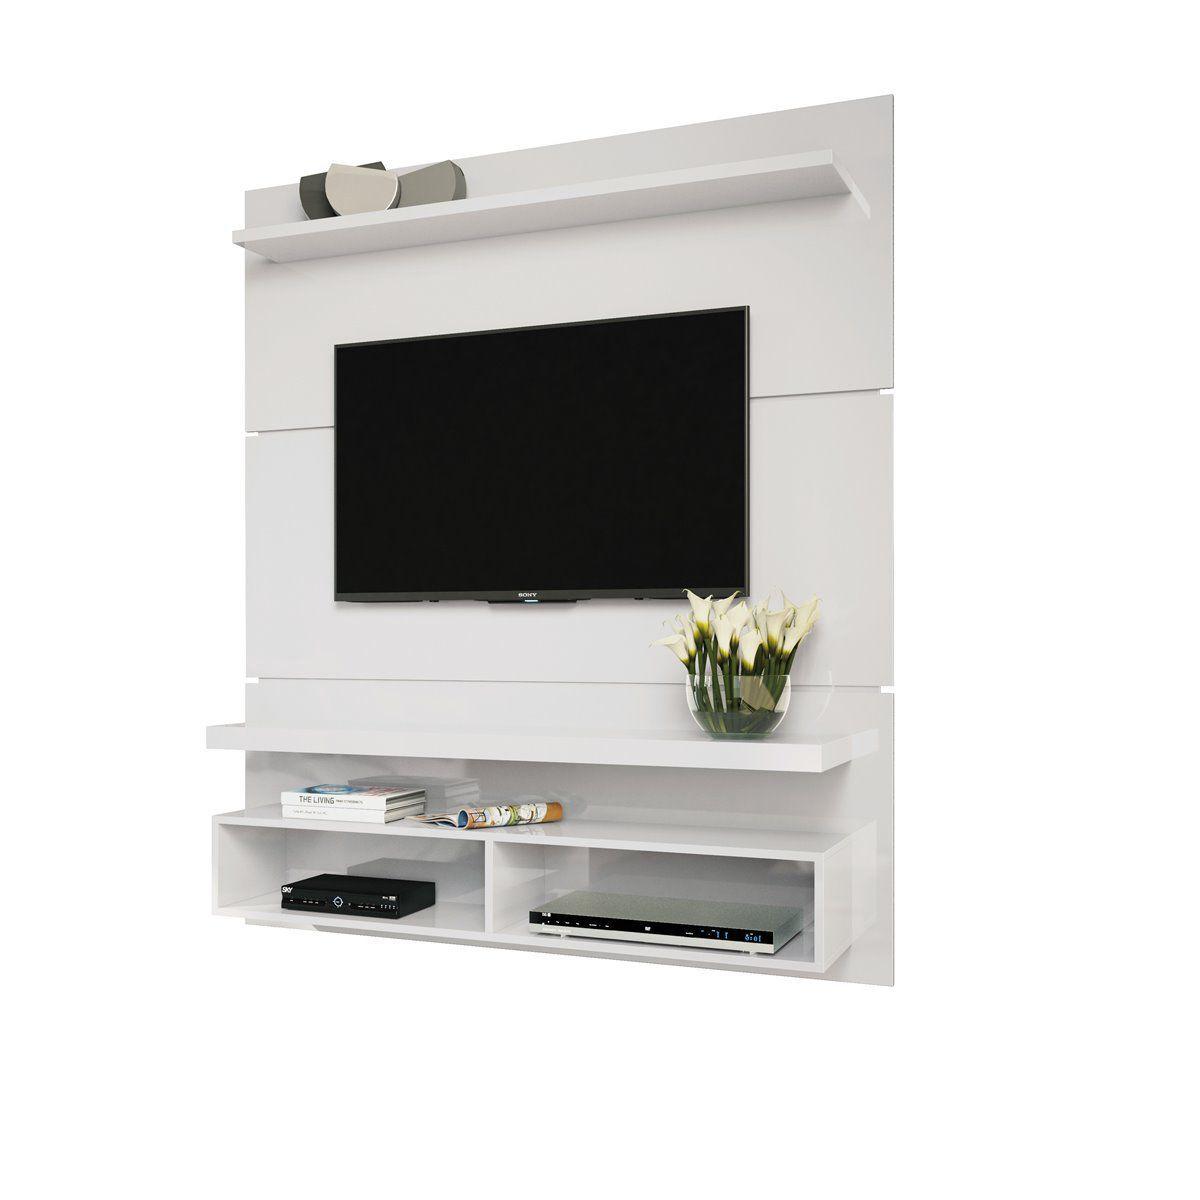 "Painel p/ TV 50"" Home Suspenso Life 1.3 HB Móveis Branco"